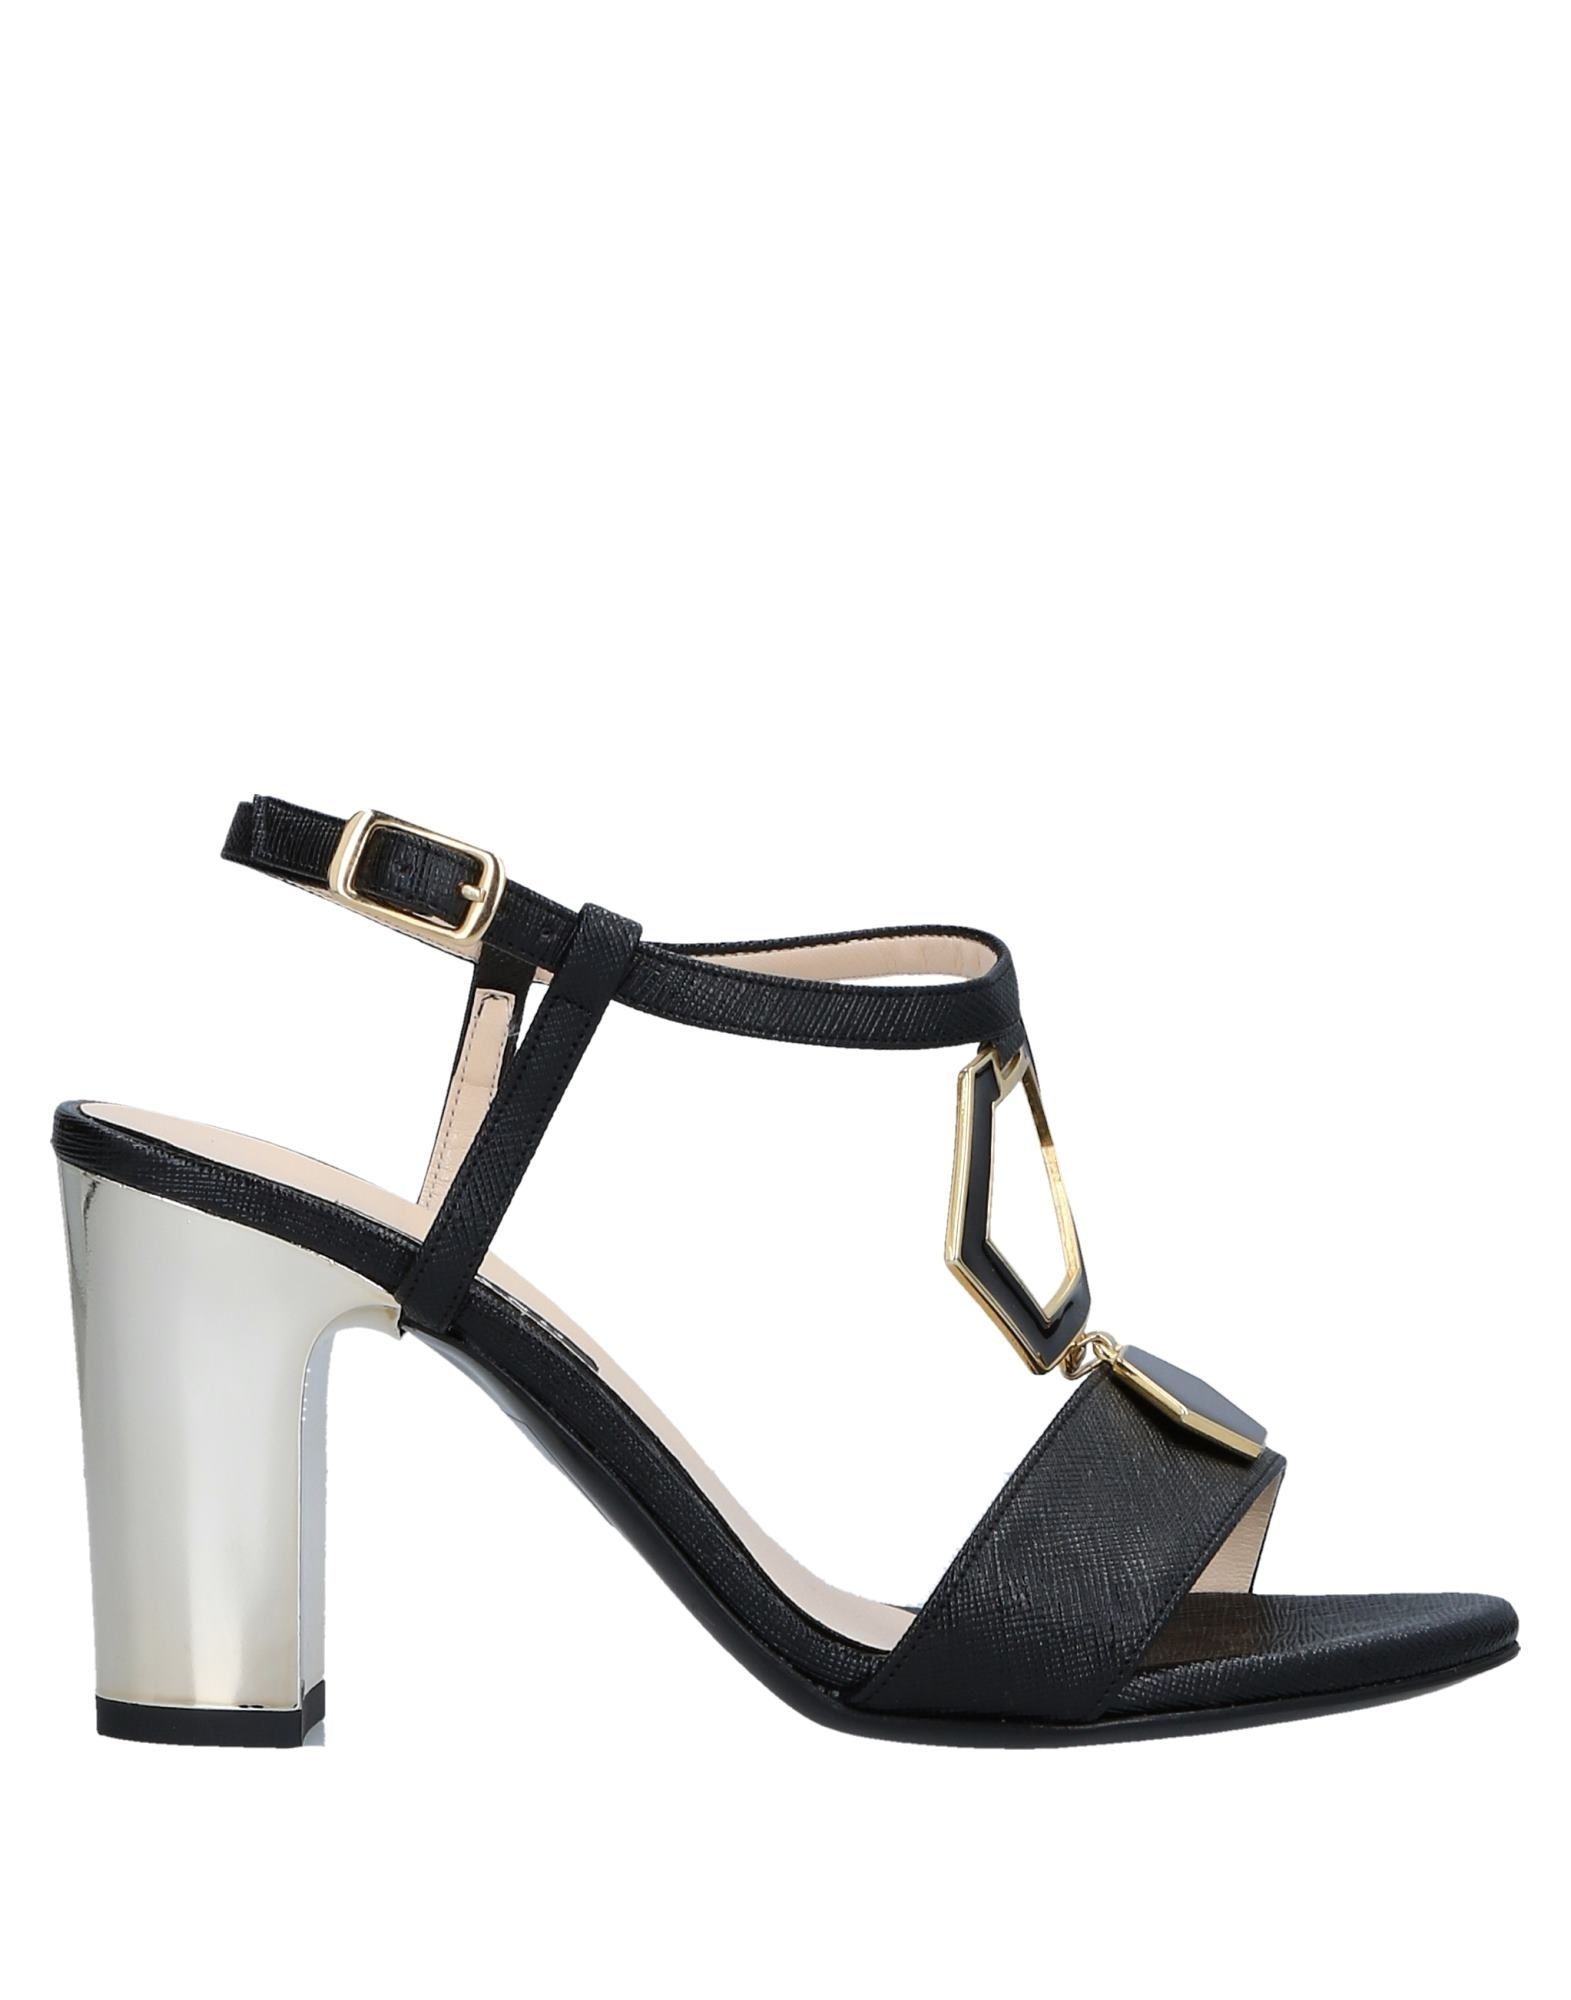 Albano Sandalen Damen Qualität  11538250UK Gute Qualität Damen beliebte Schuhe 4cf51f